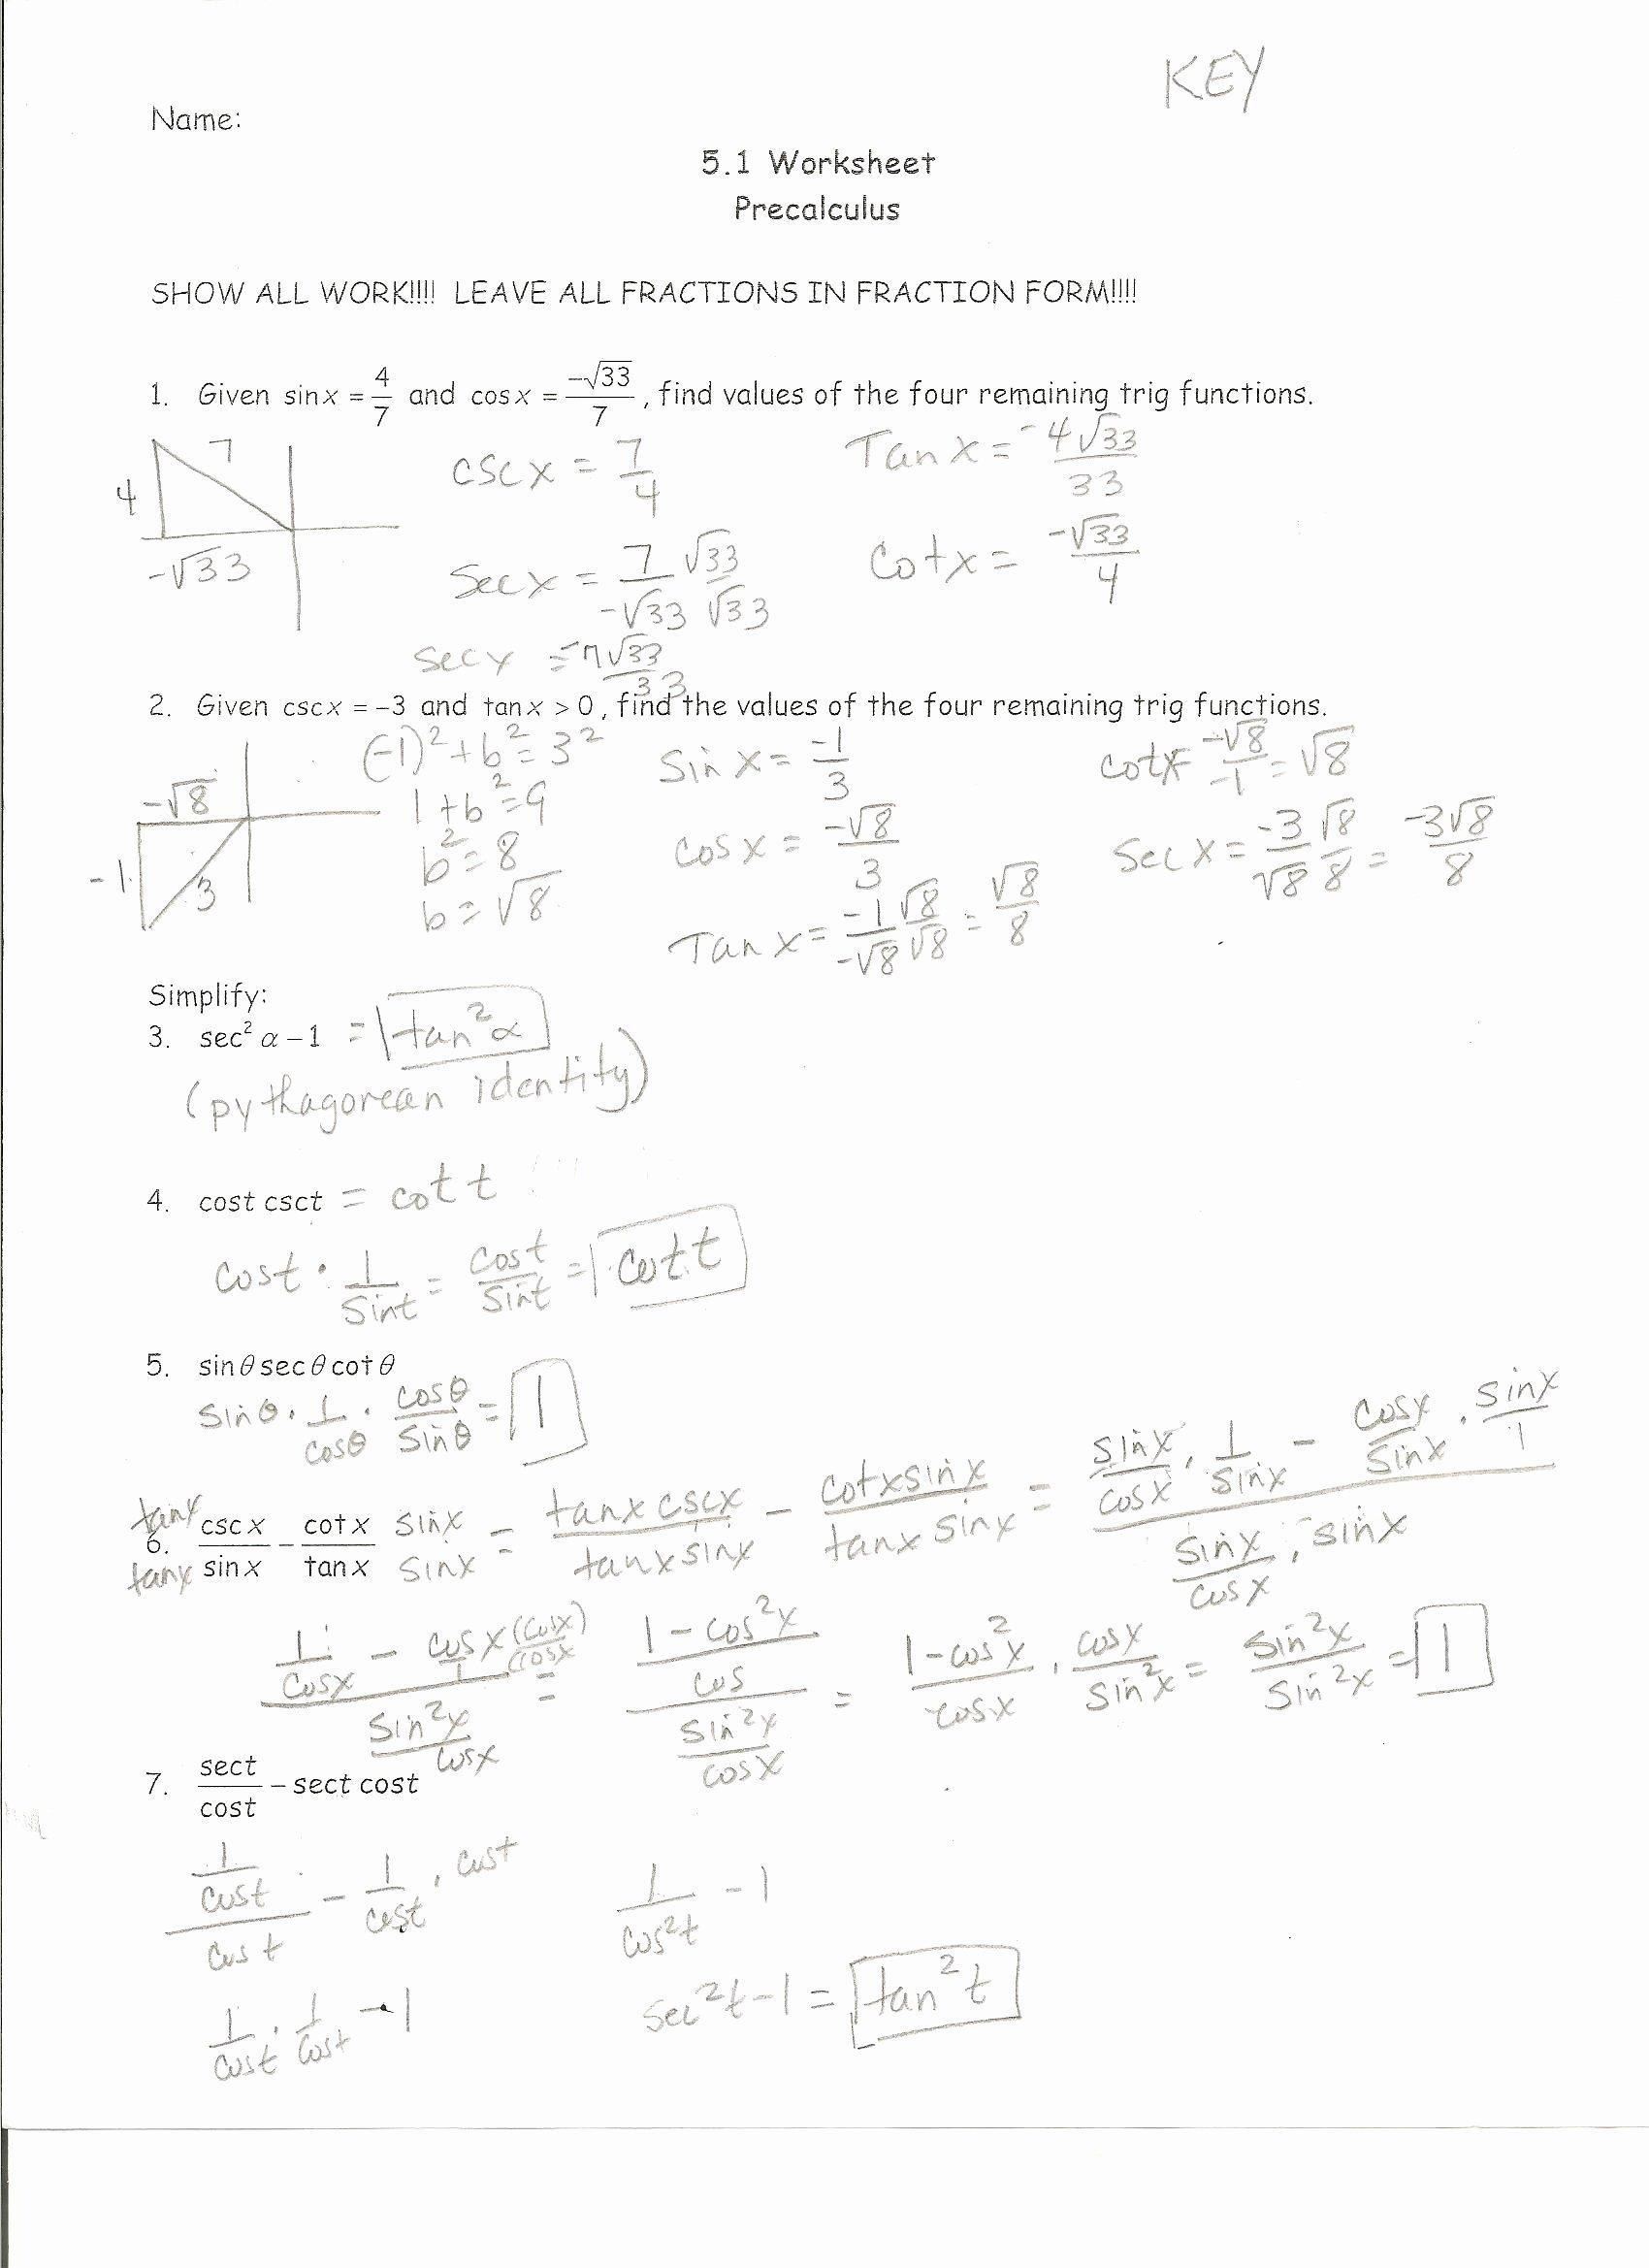 Interval Notation Worksheet with Answers Fresh Math Precalculus Laba Worksheet 5 1 Key